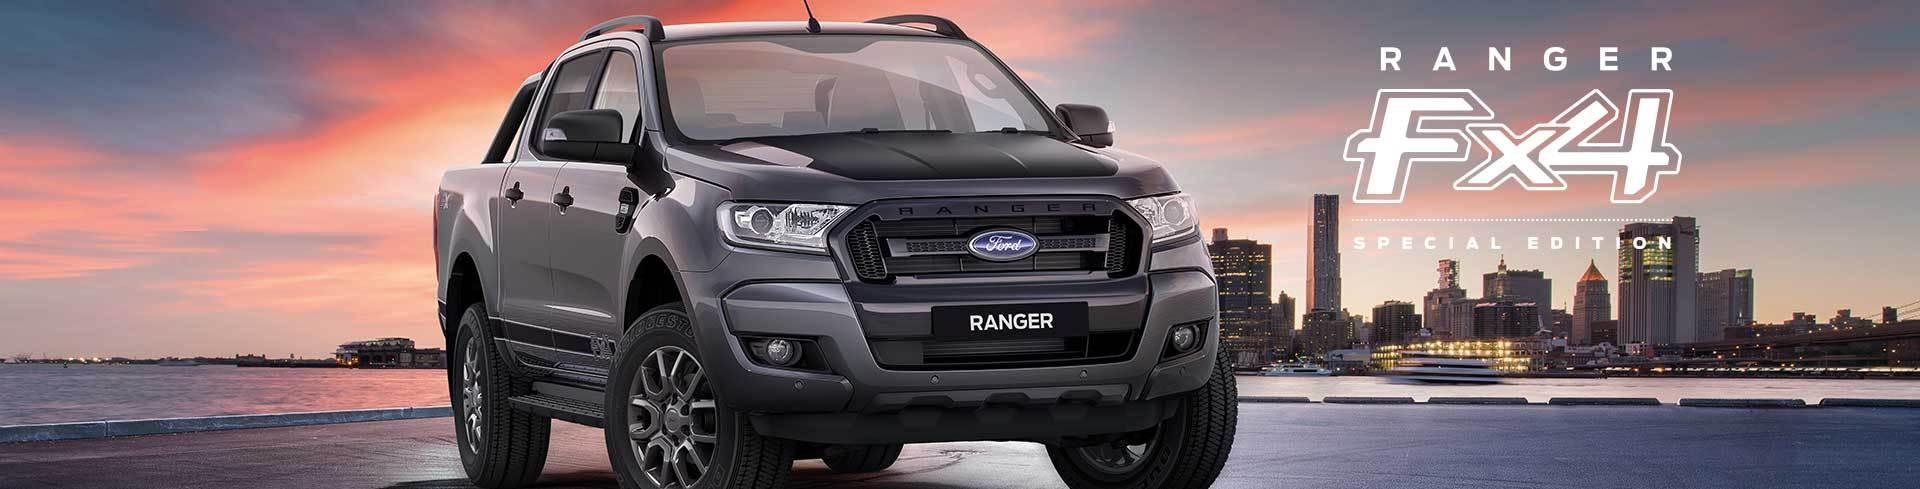 Ranger Fx4 - Special Edition